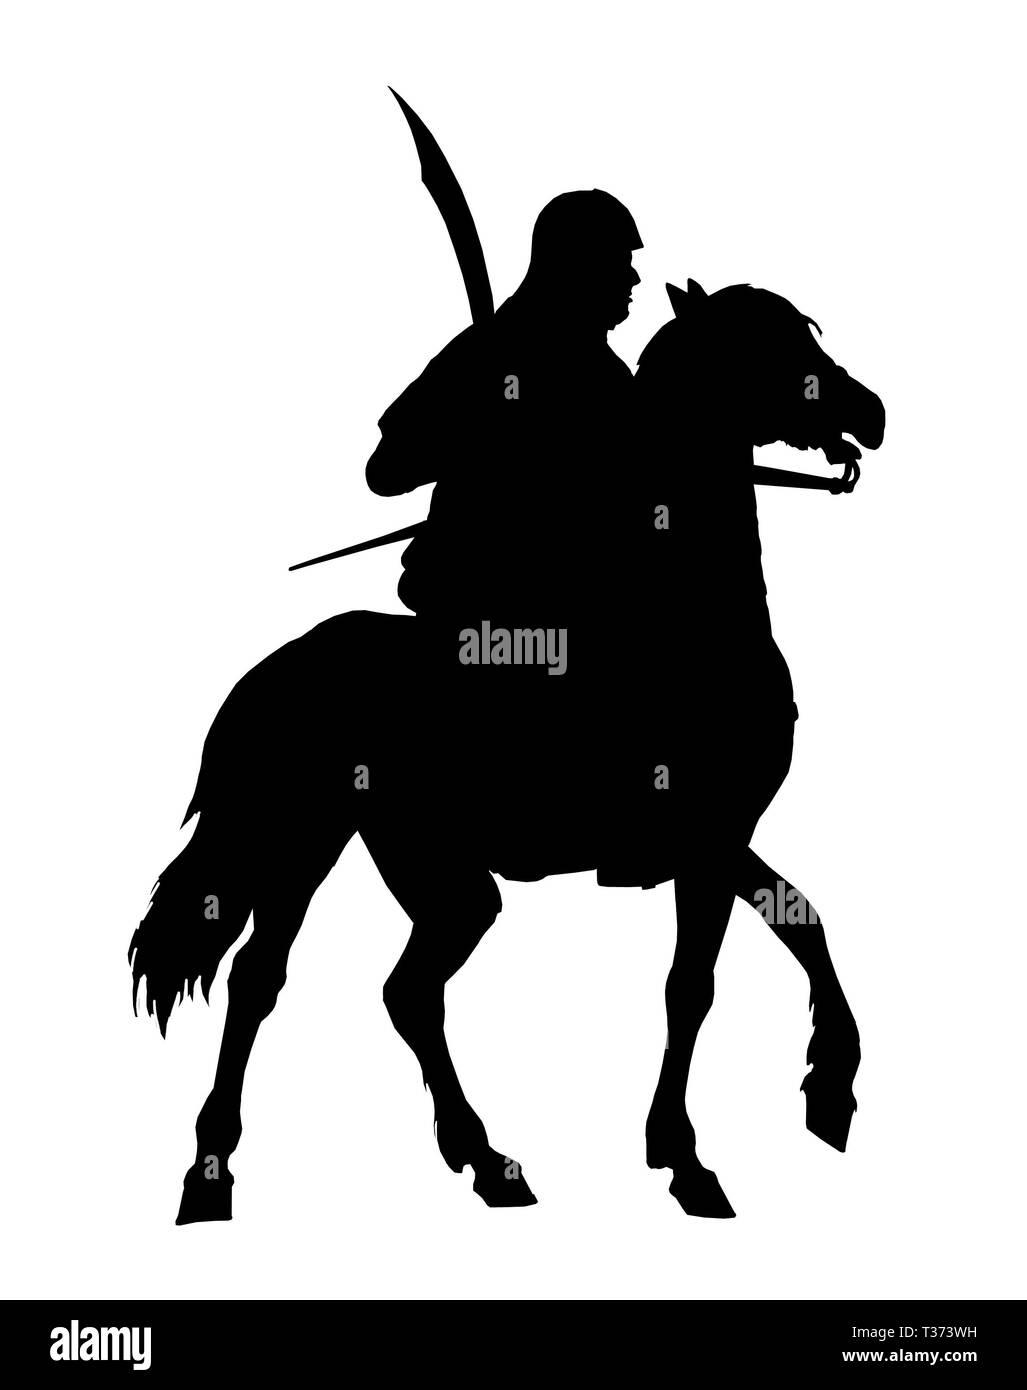 Mounted germanic knight silhouette. Teutonic knight illustration. Crusader on horseback. - Stock Image